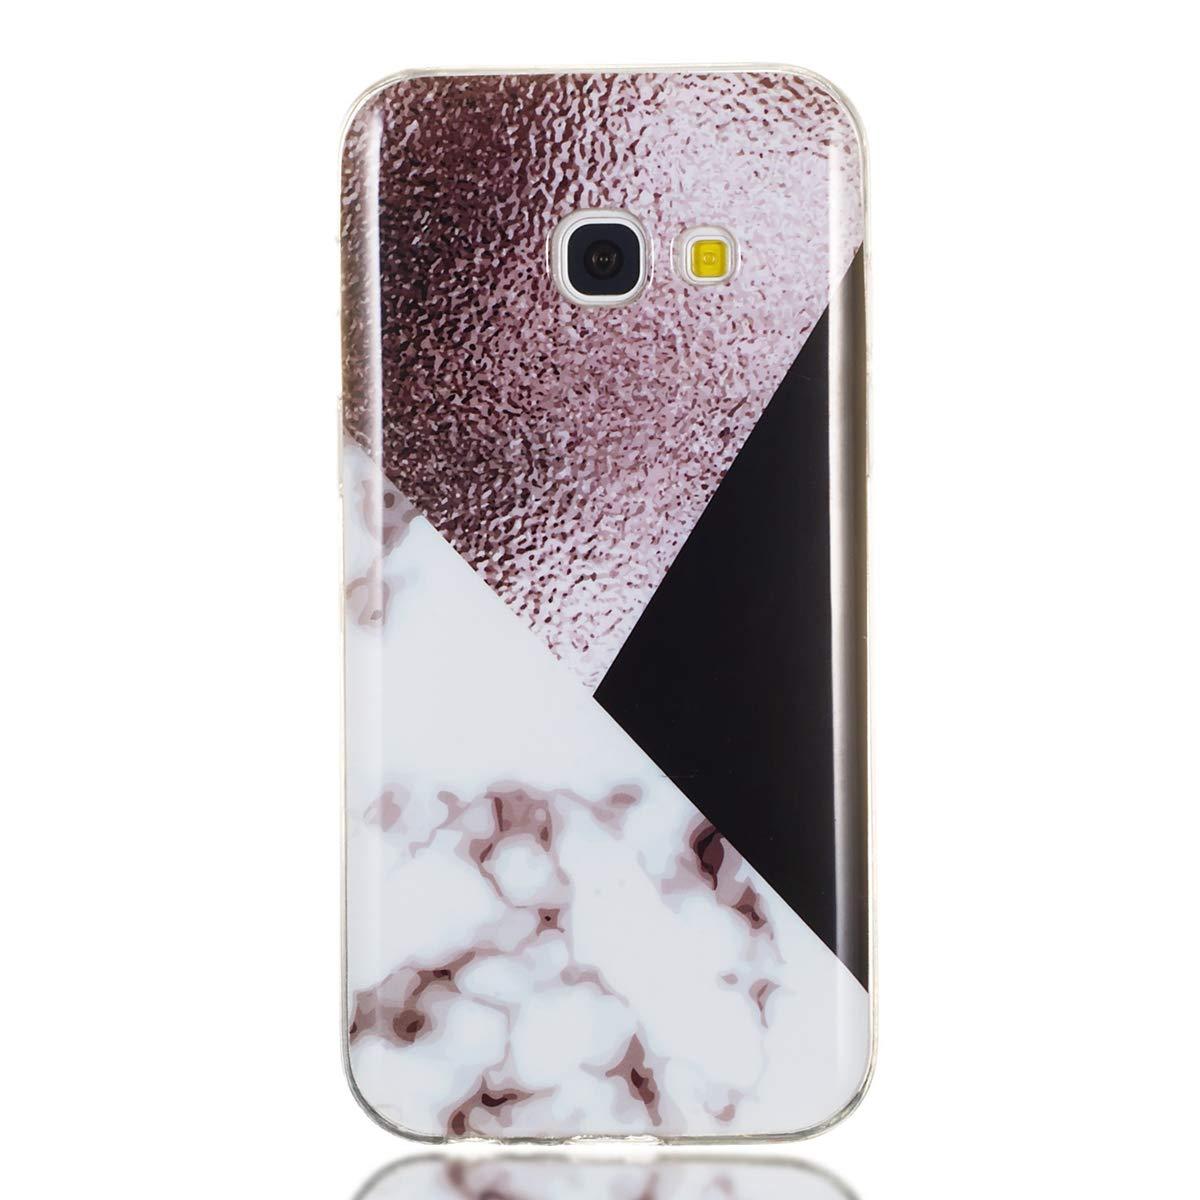 Bl/ätter Weich TPU Silikon Handyh/ülle mit IMD Technologie Schutzh/ülle Flexible D/ünn Backcover f/ür Samsung Galaxy A3 2017 A320 Misstars Marmor H/ülle f/ür Galaxy A3 2017